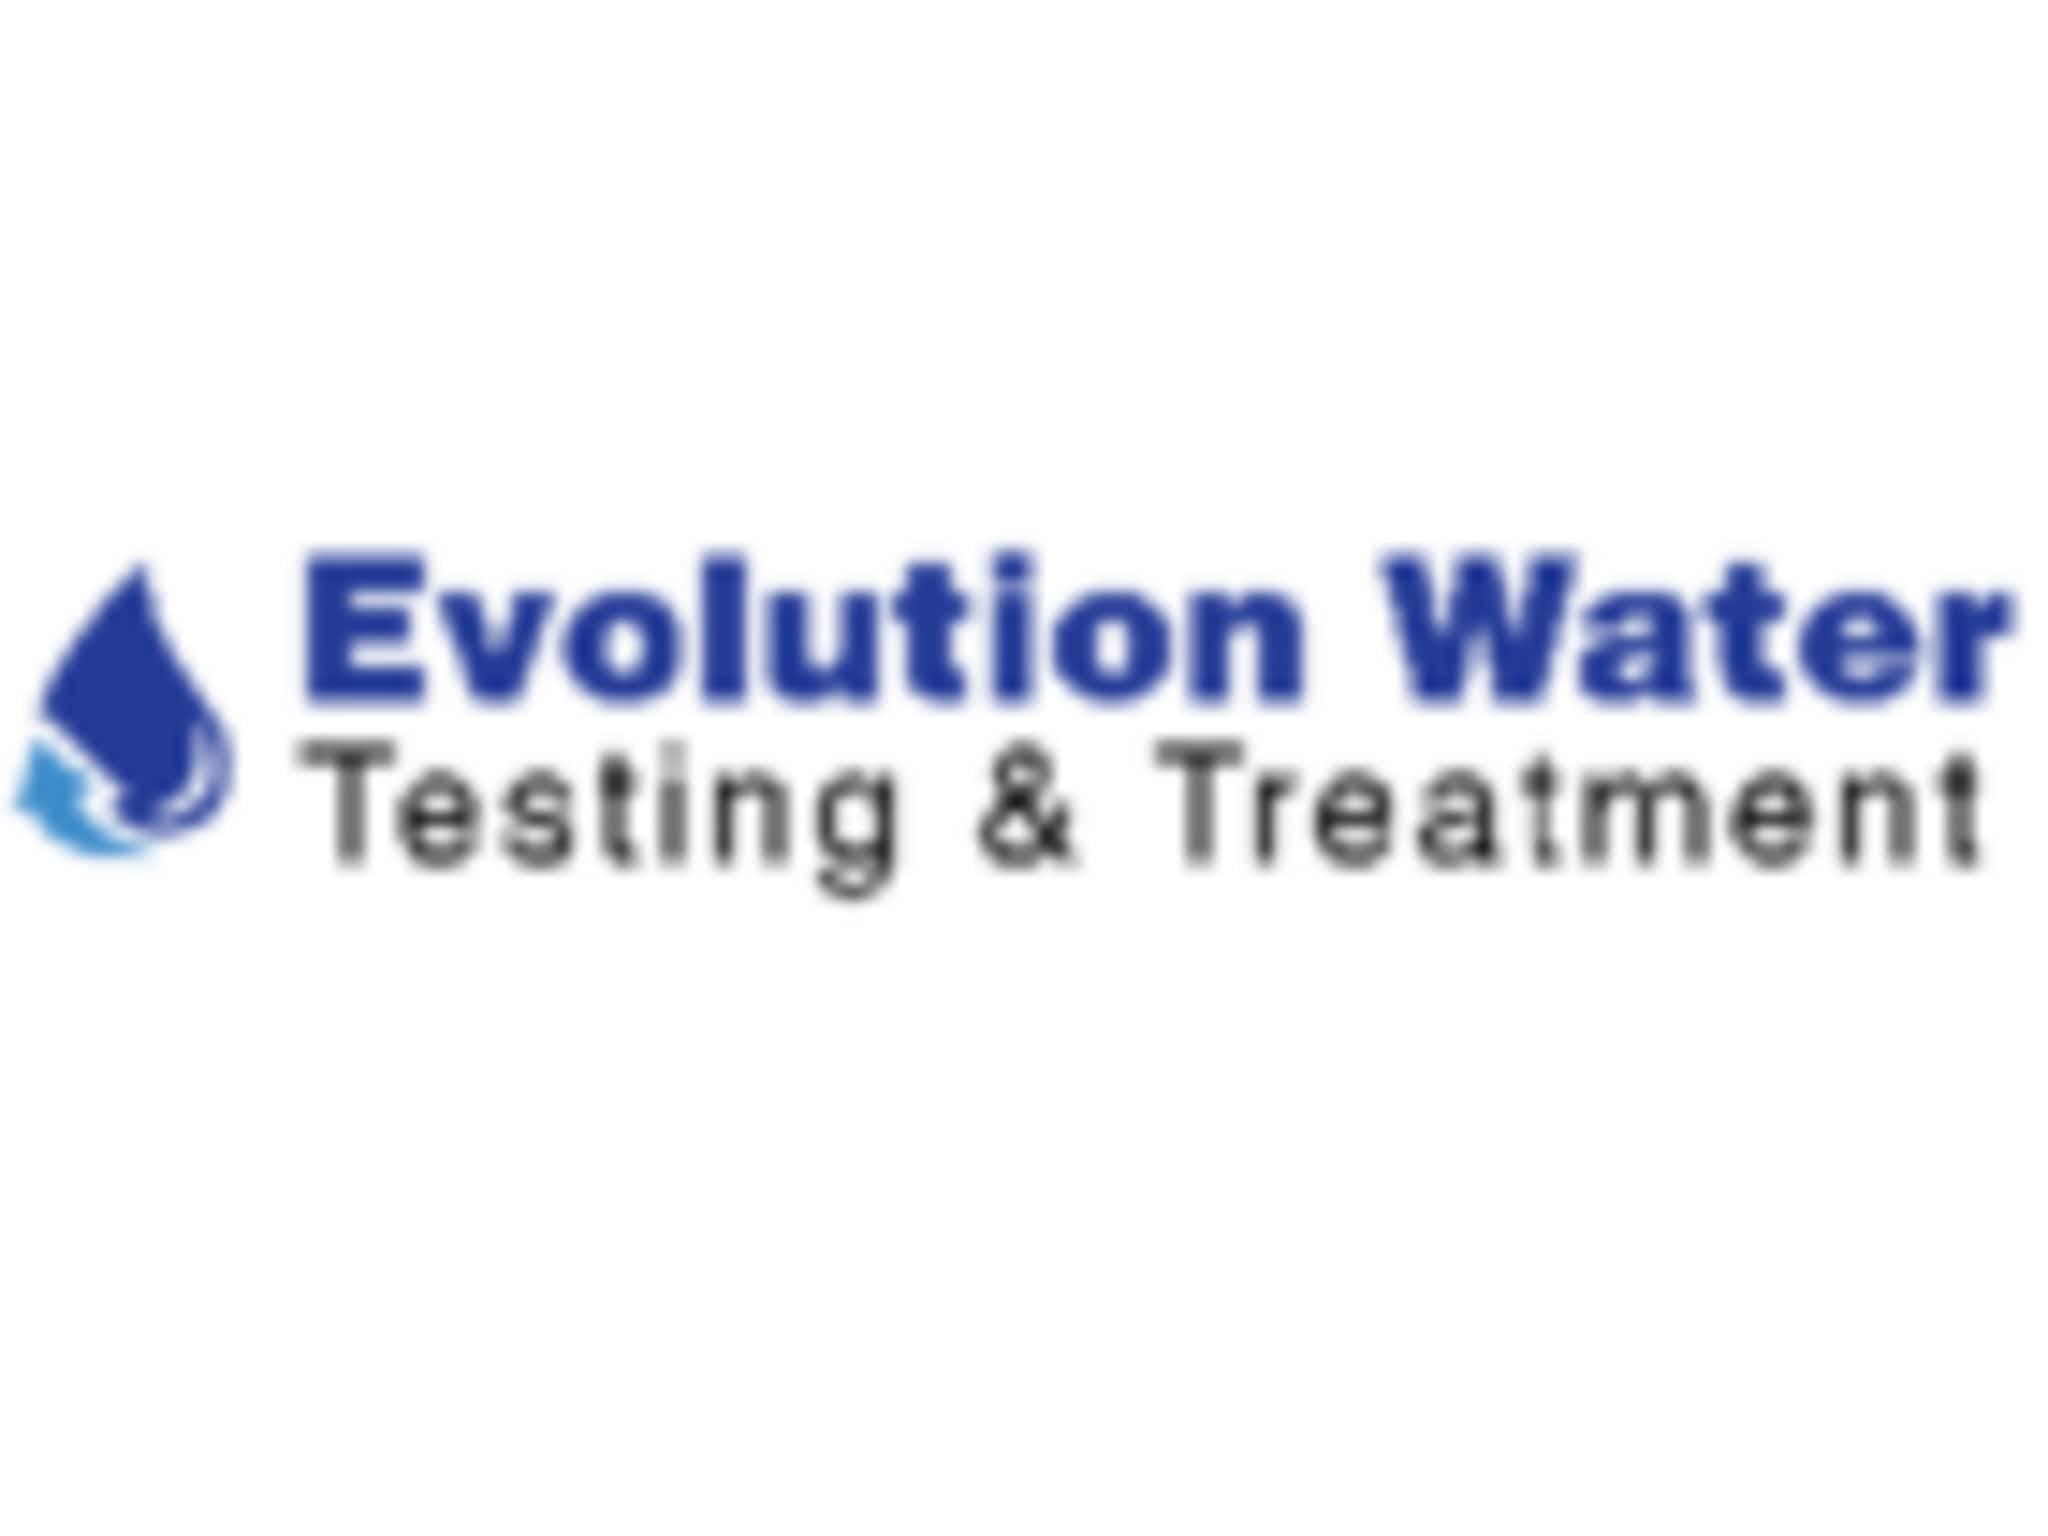 photo Evolution Water Testing & Treatment